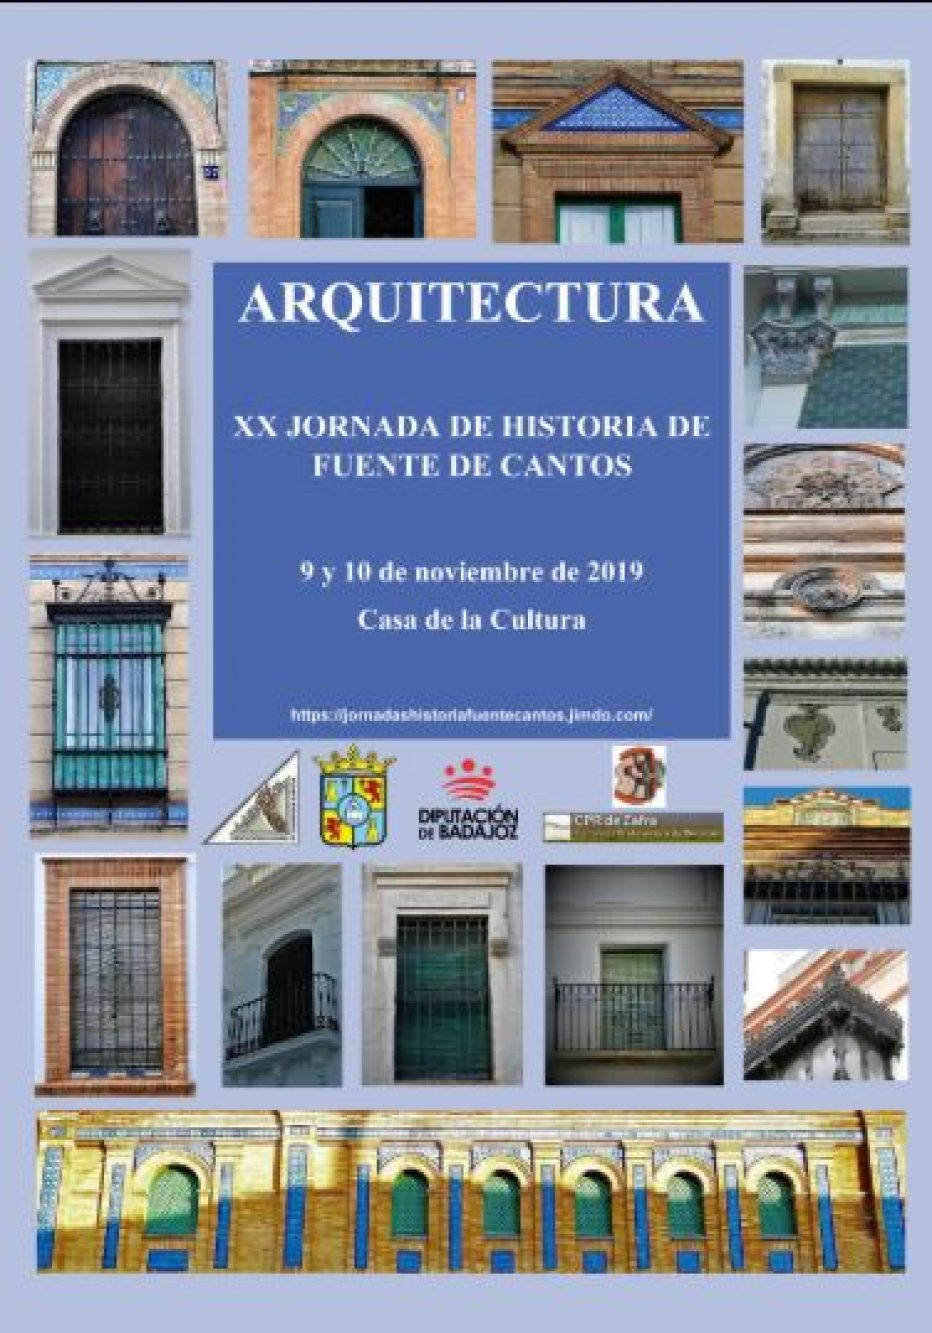 XX JORNADA DE HISTORIA DE FUENTE DE CANTOS